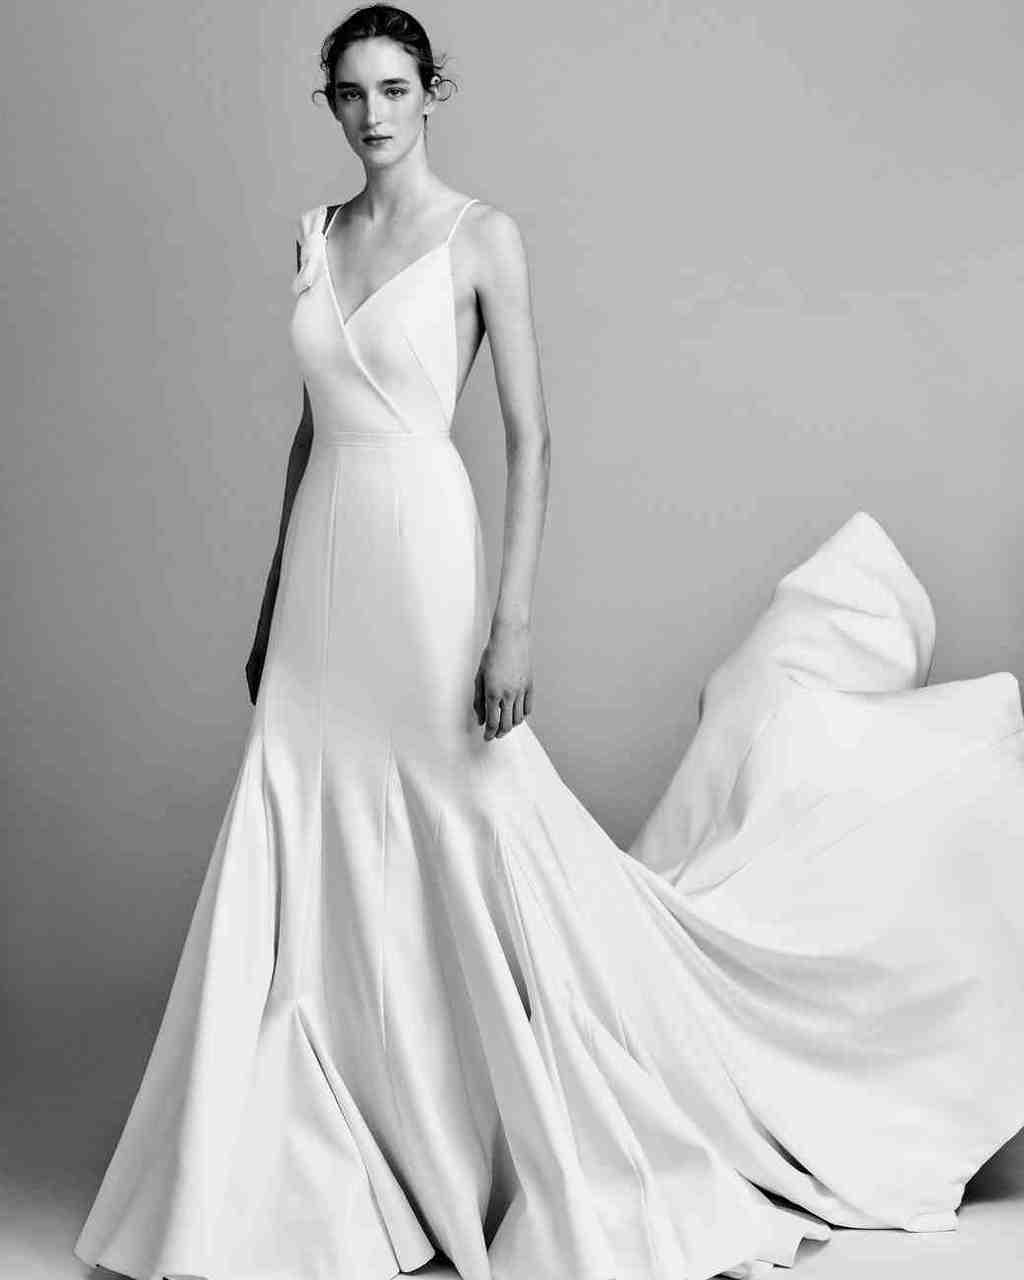 viktor-and-rolf-fall-2017-wedding-dress-009_vert-1